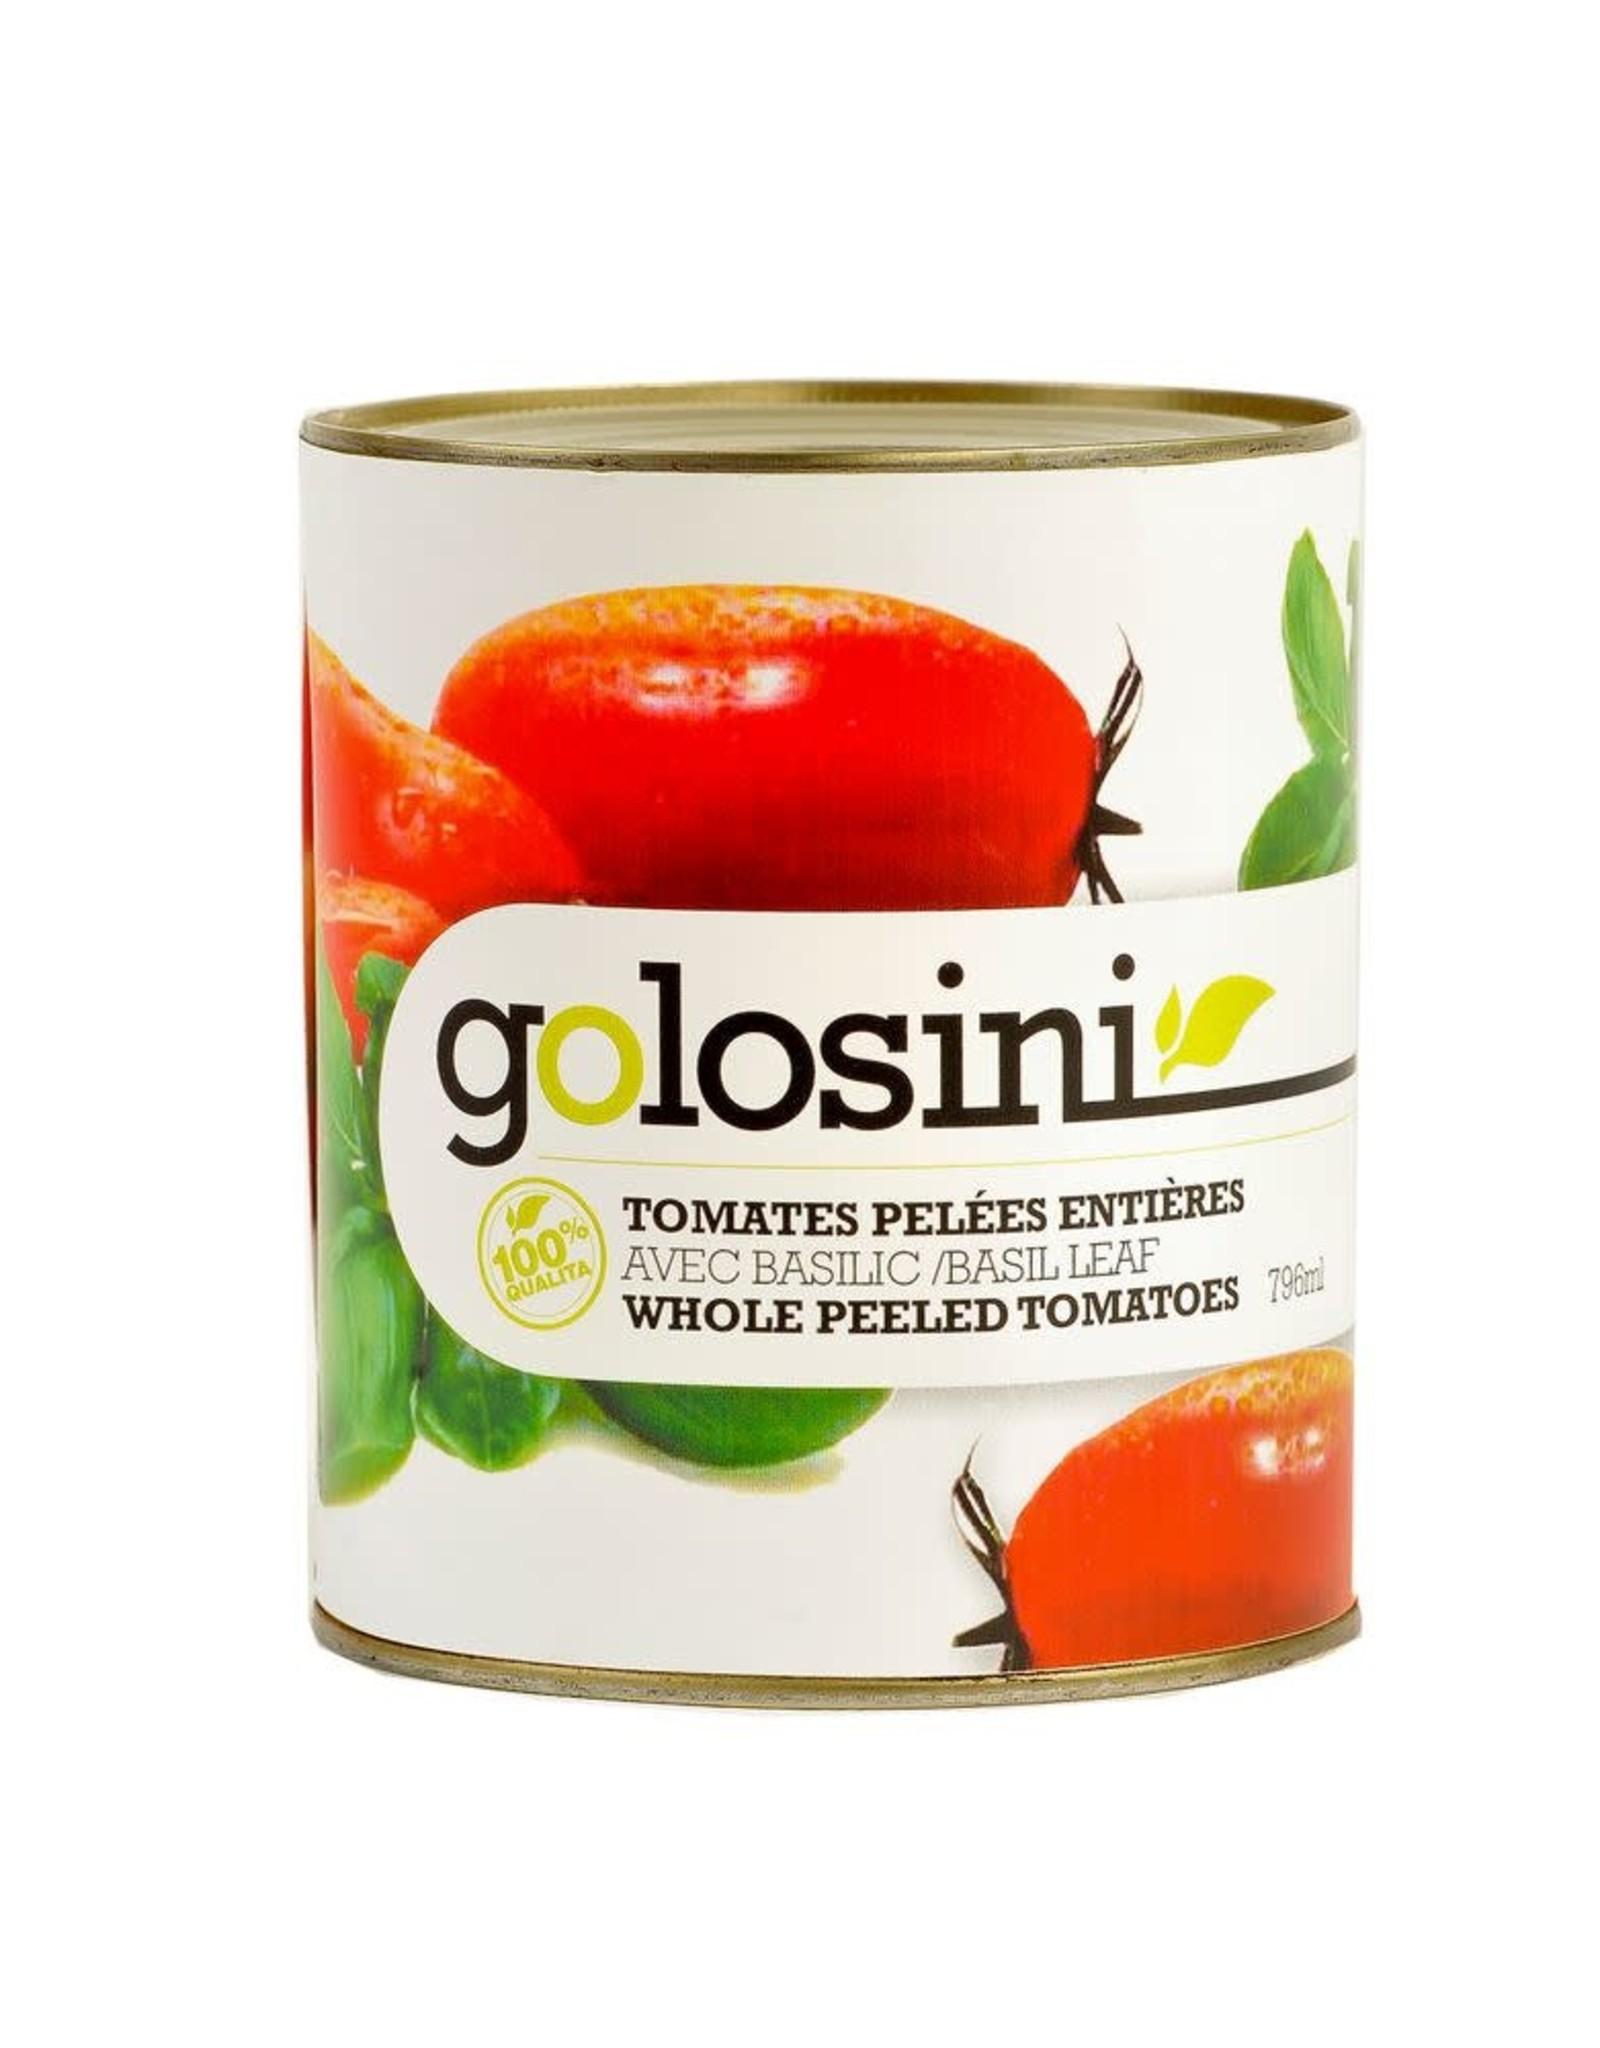 Golosini Golosini - Whole Peeled Tomatoes w/ Basil (796ml)